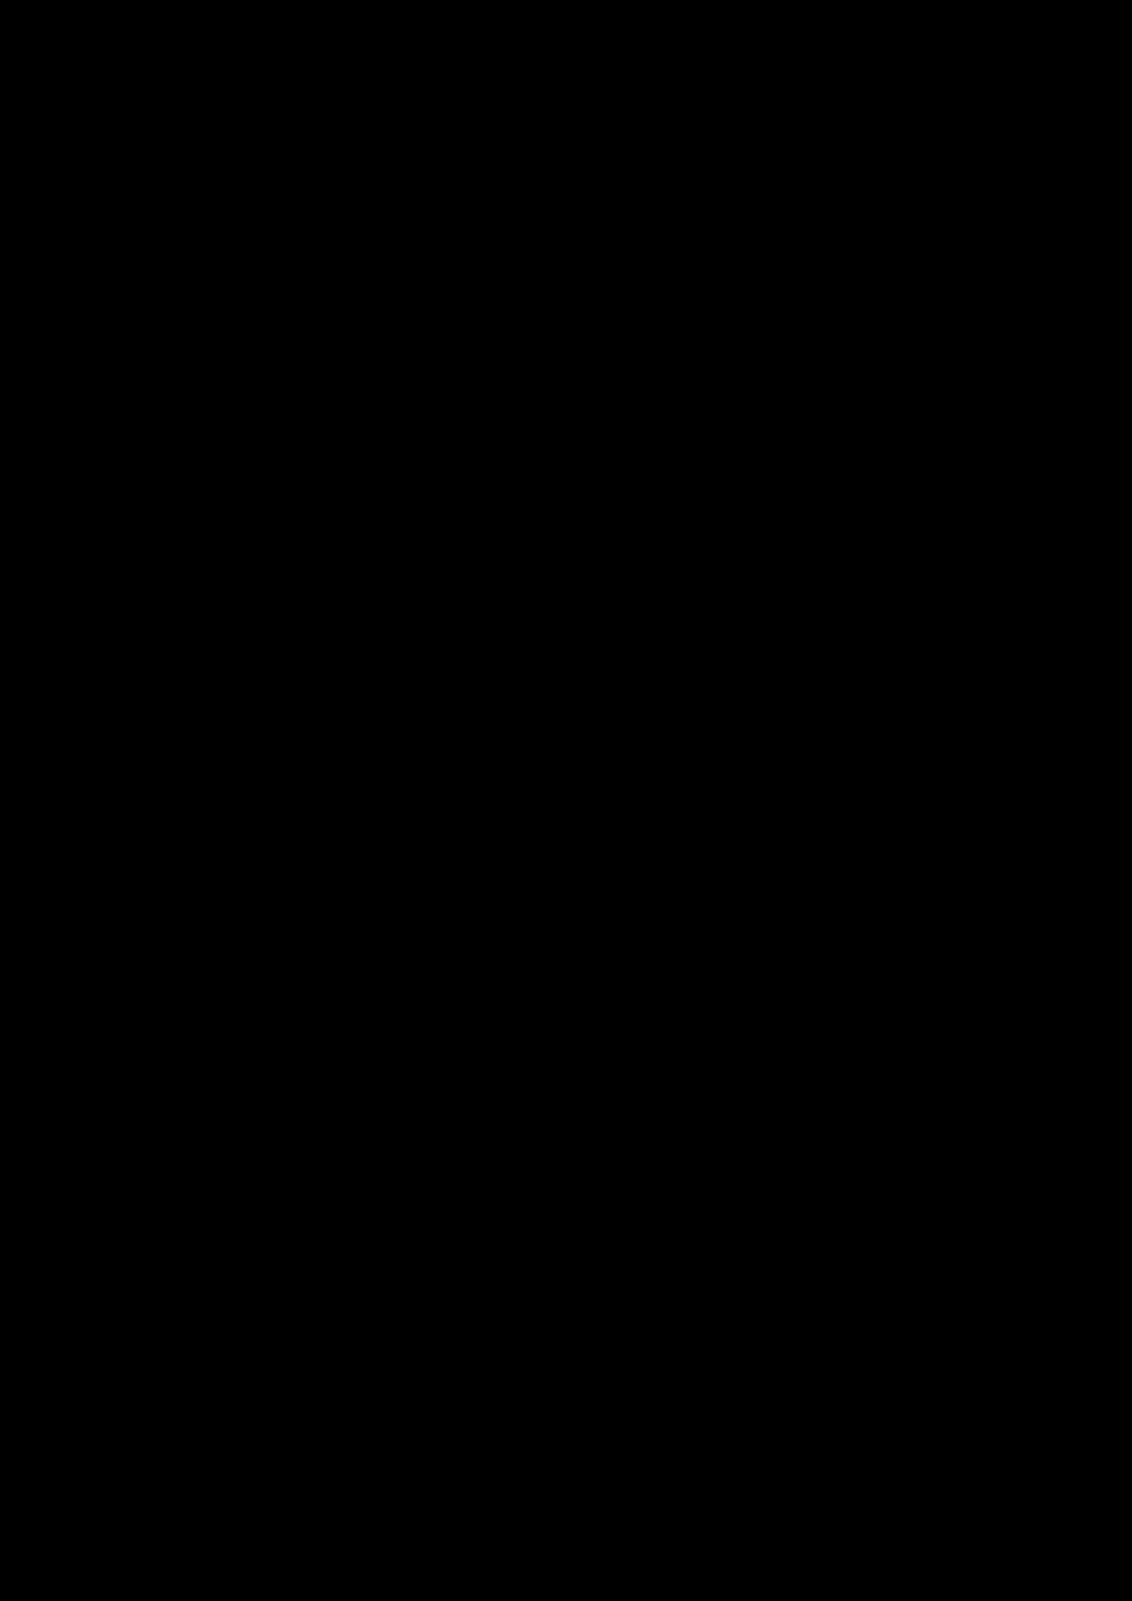 Korolevstvo slez slide, Image 32